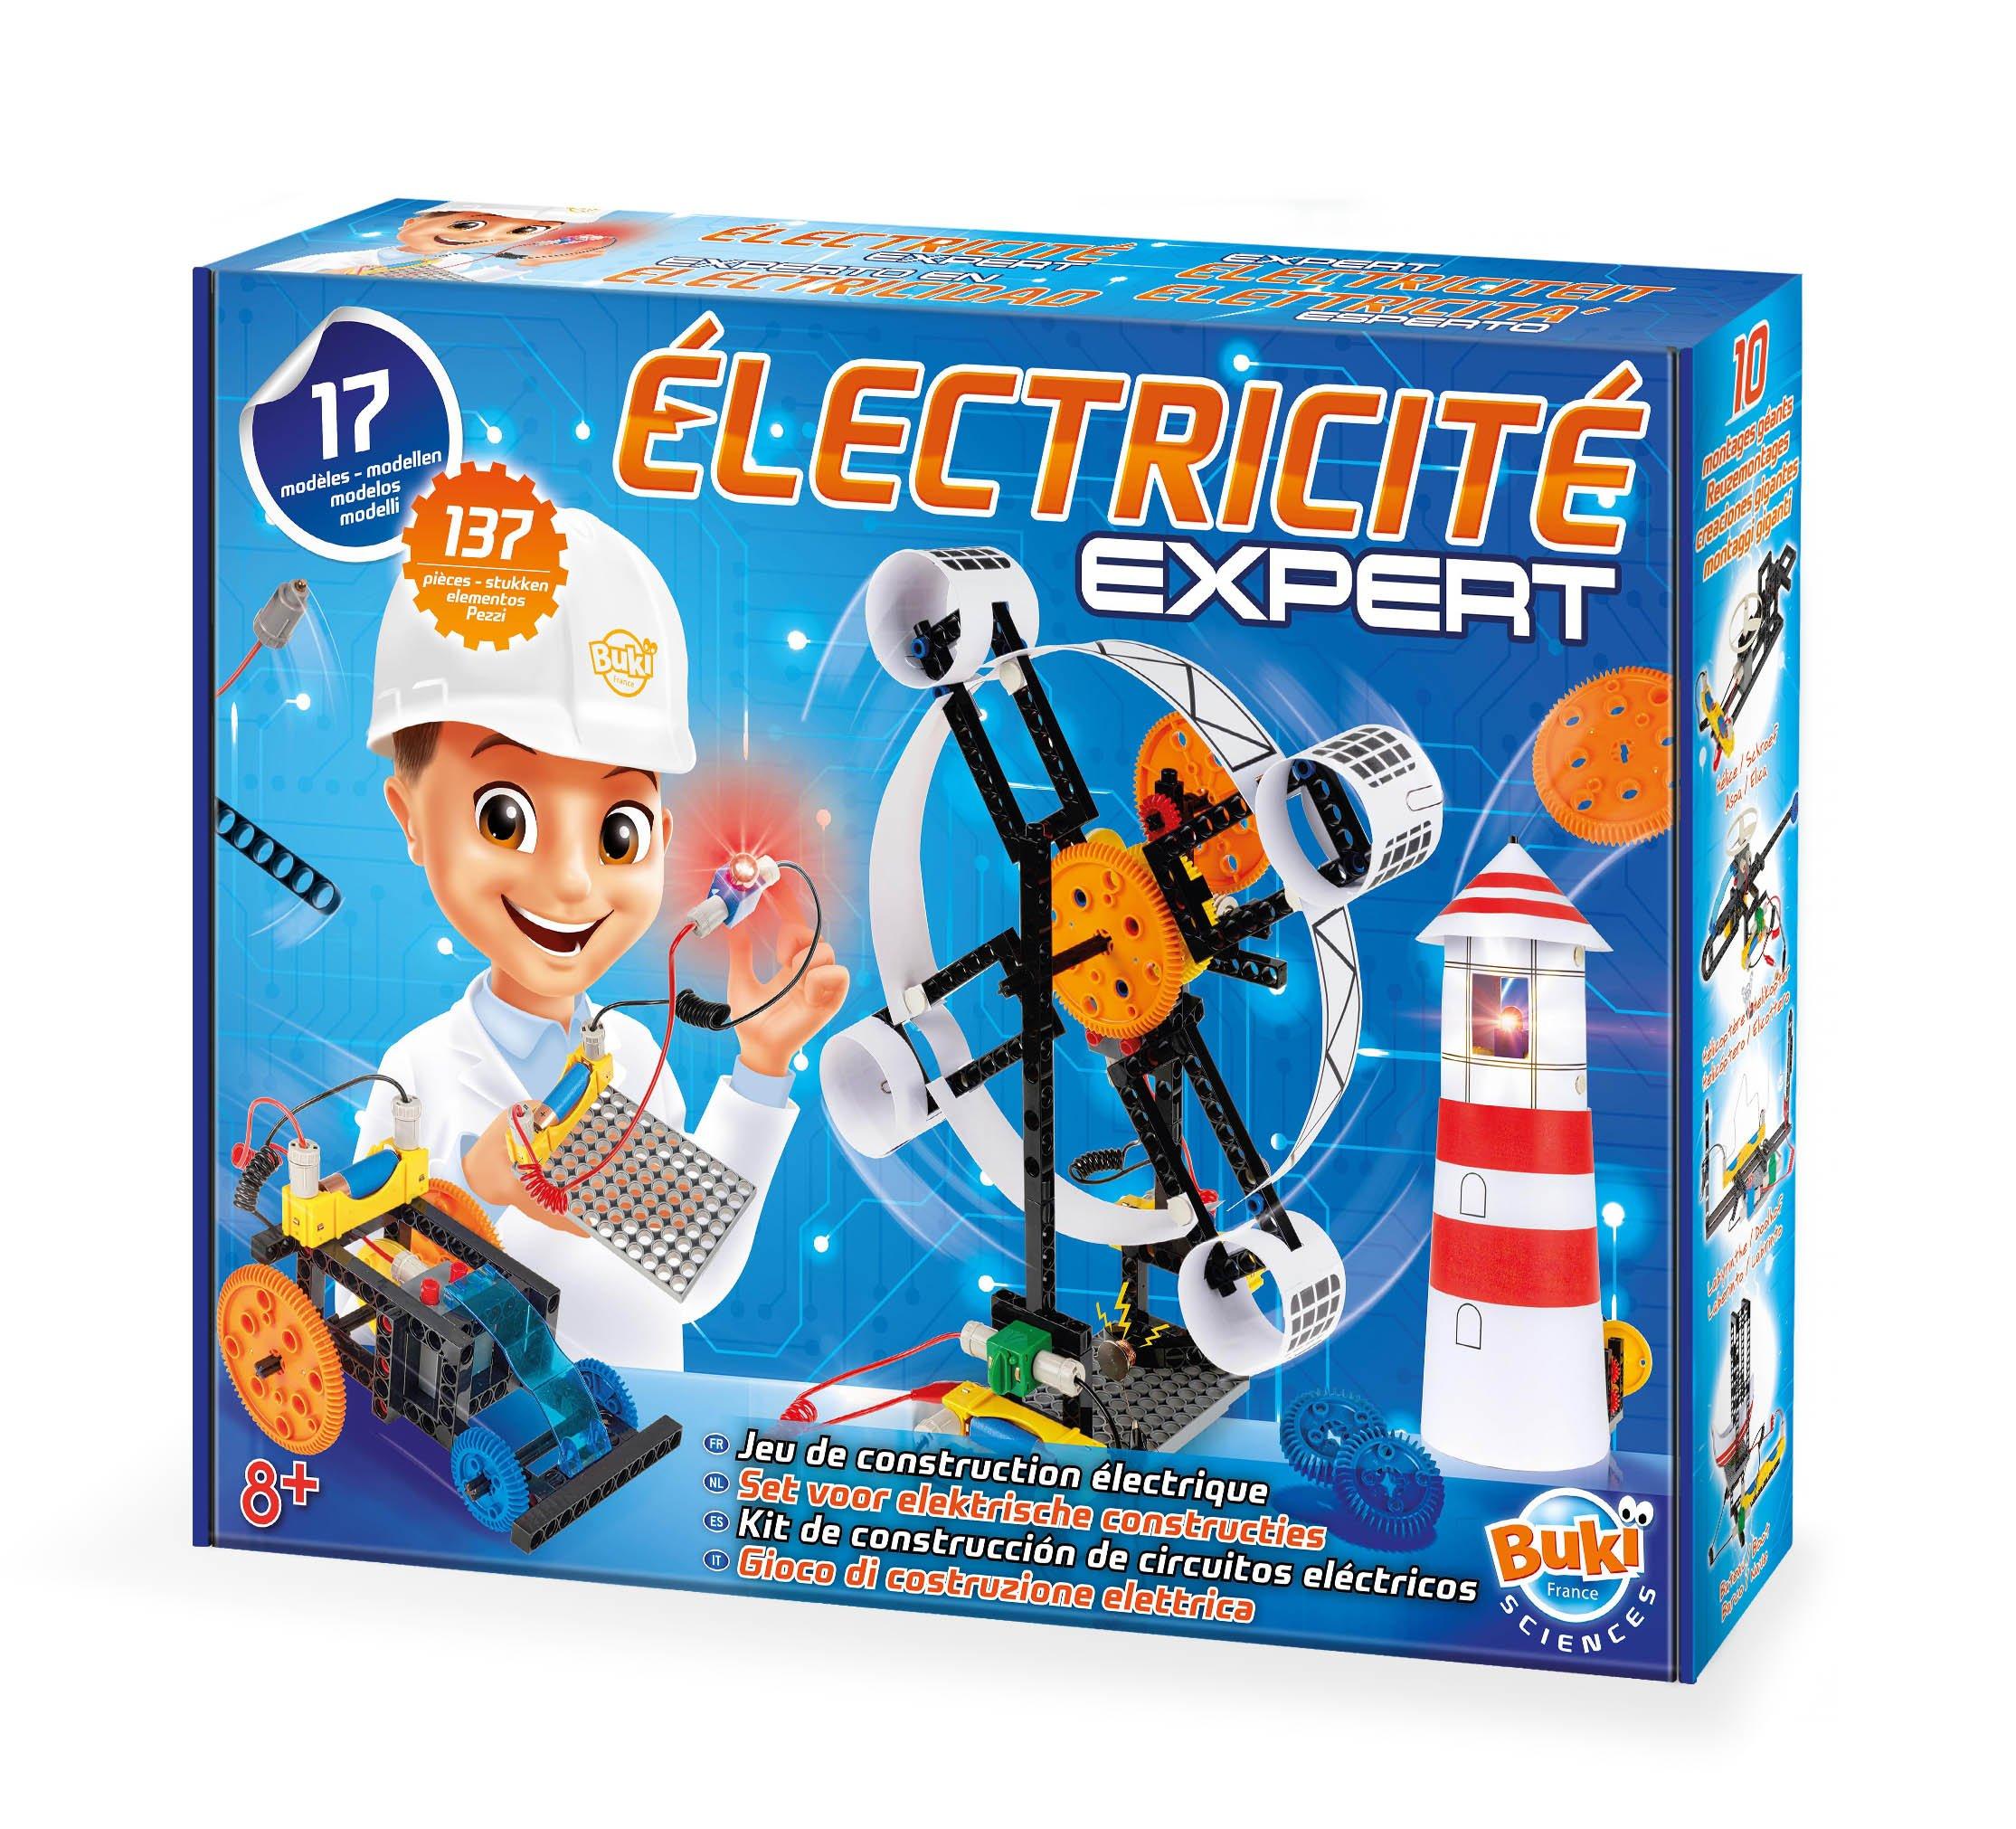 Buki - 7153 - Electricité Expert product image